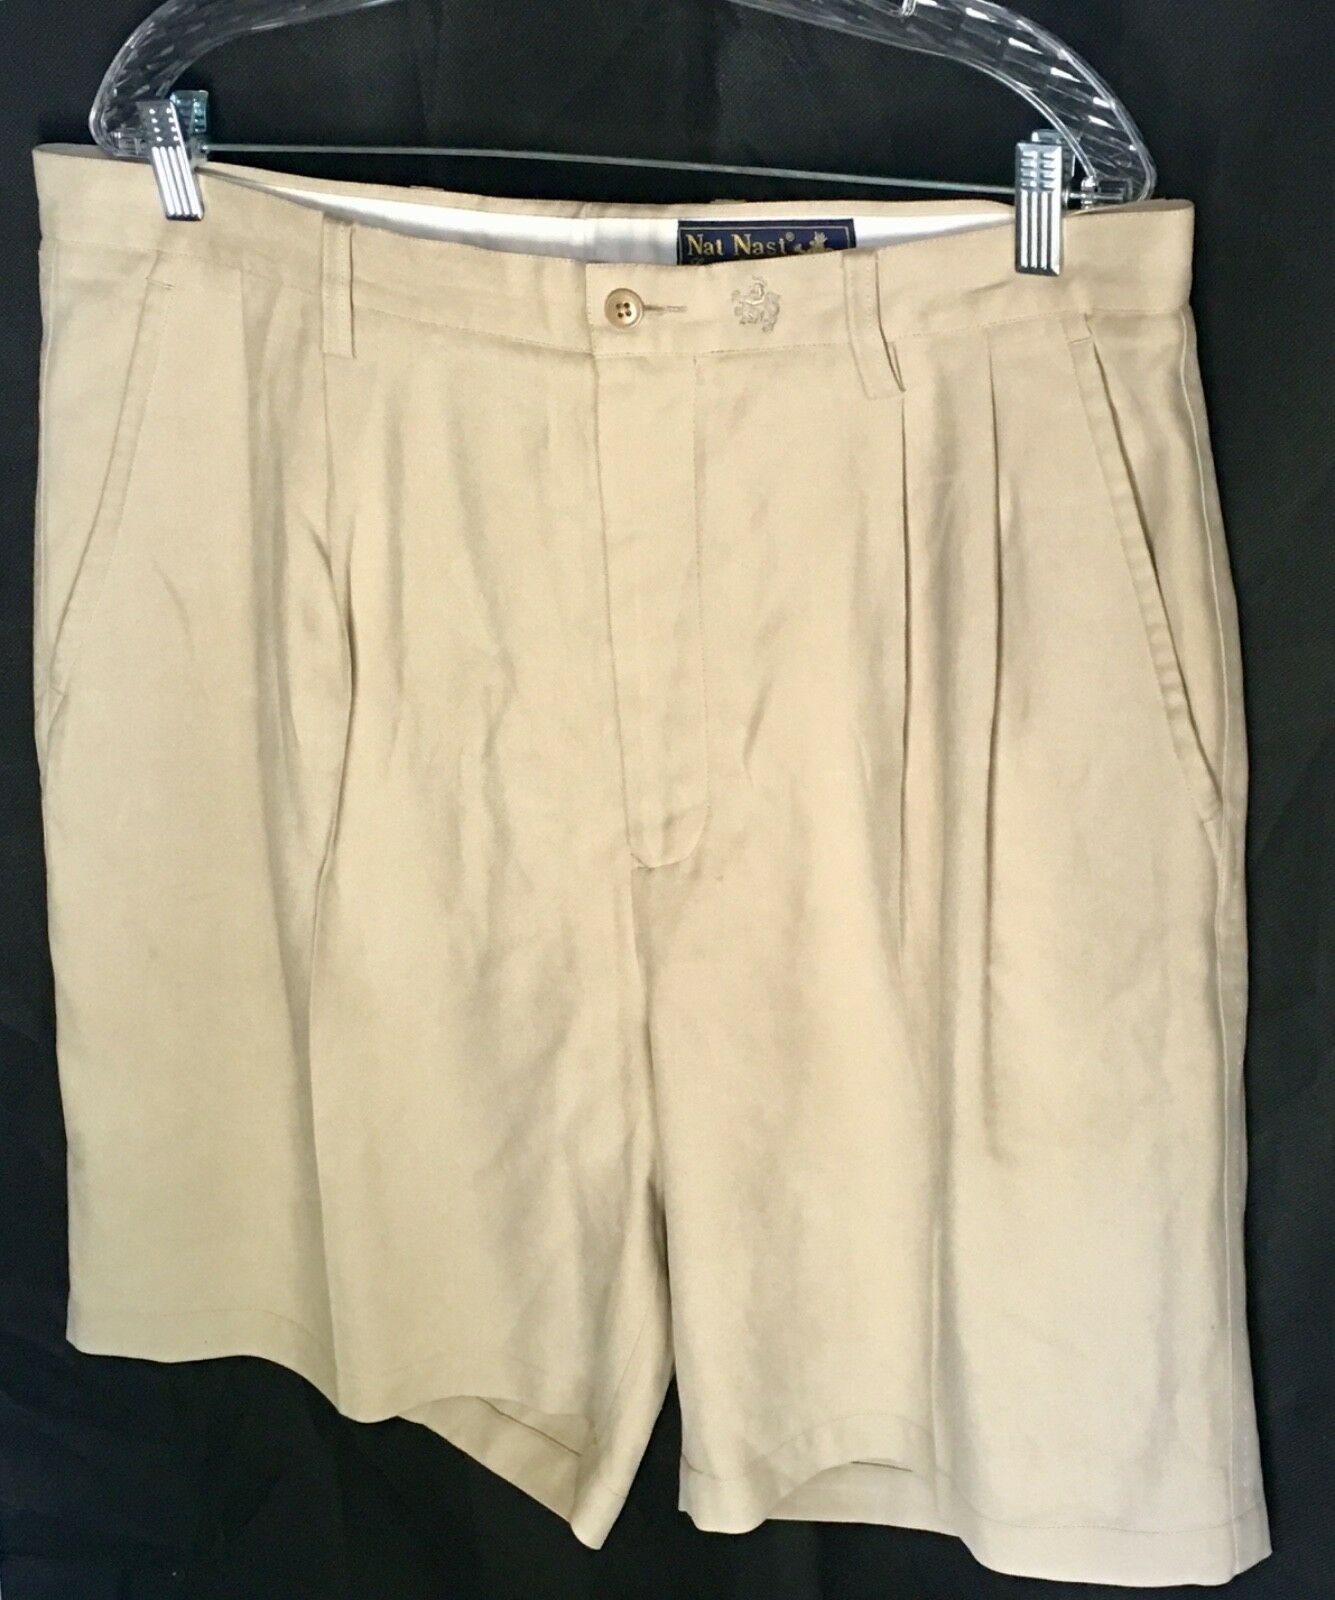 43e97fe00de52f Nast Luxury Originals Men s Dress Shorts 100% Silk Size 36 Beige Nat ...